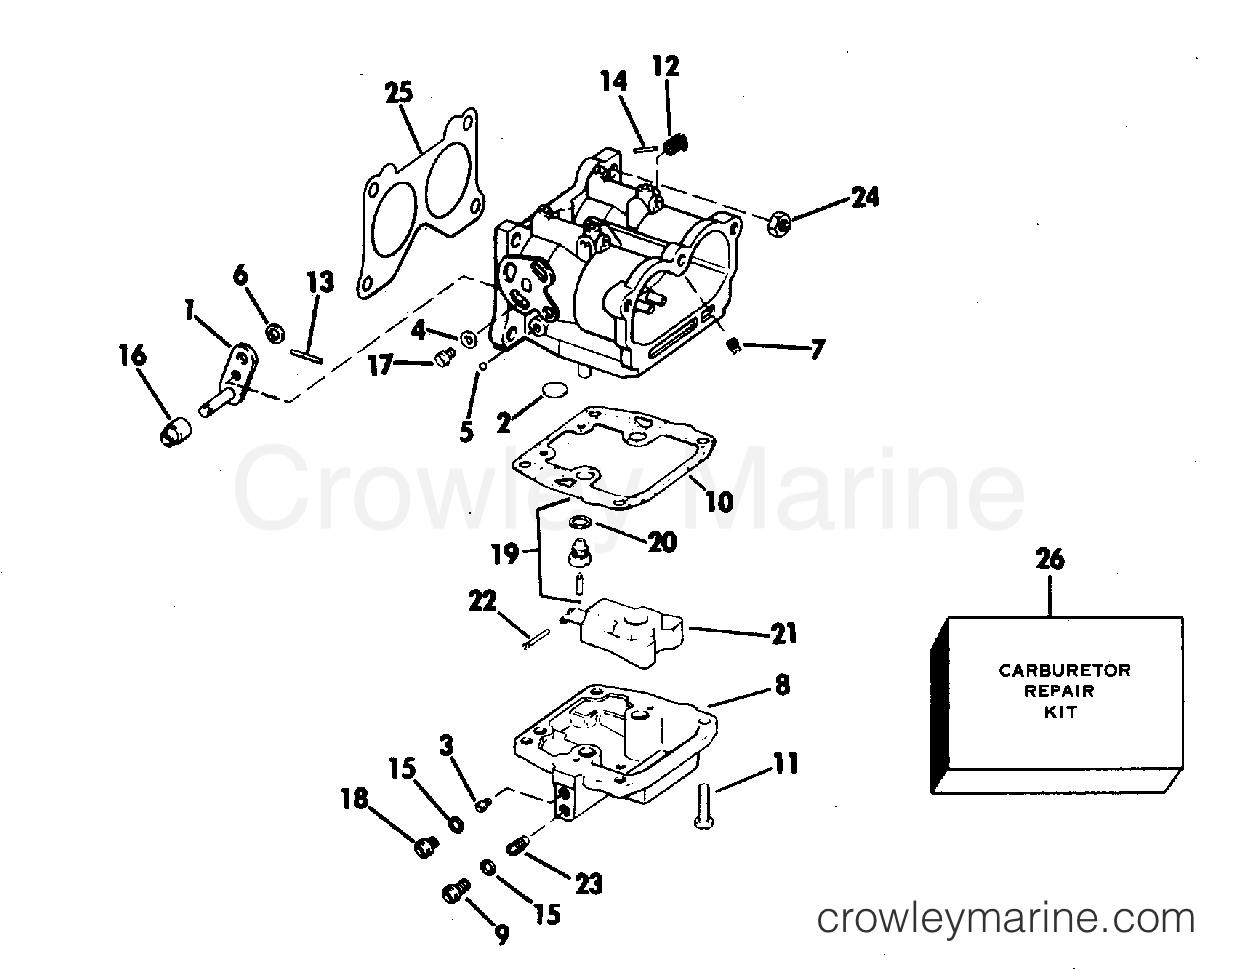 1981 Evinrude Outboards 140 - E140MLCIH CARBURETOR section